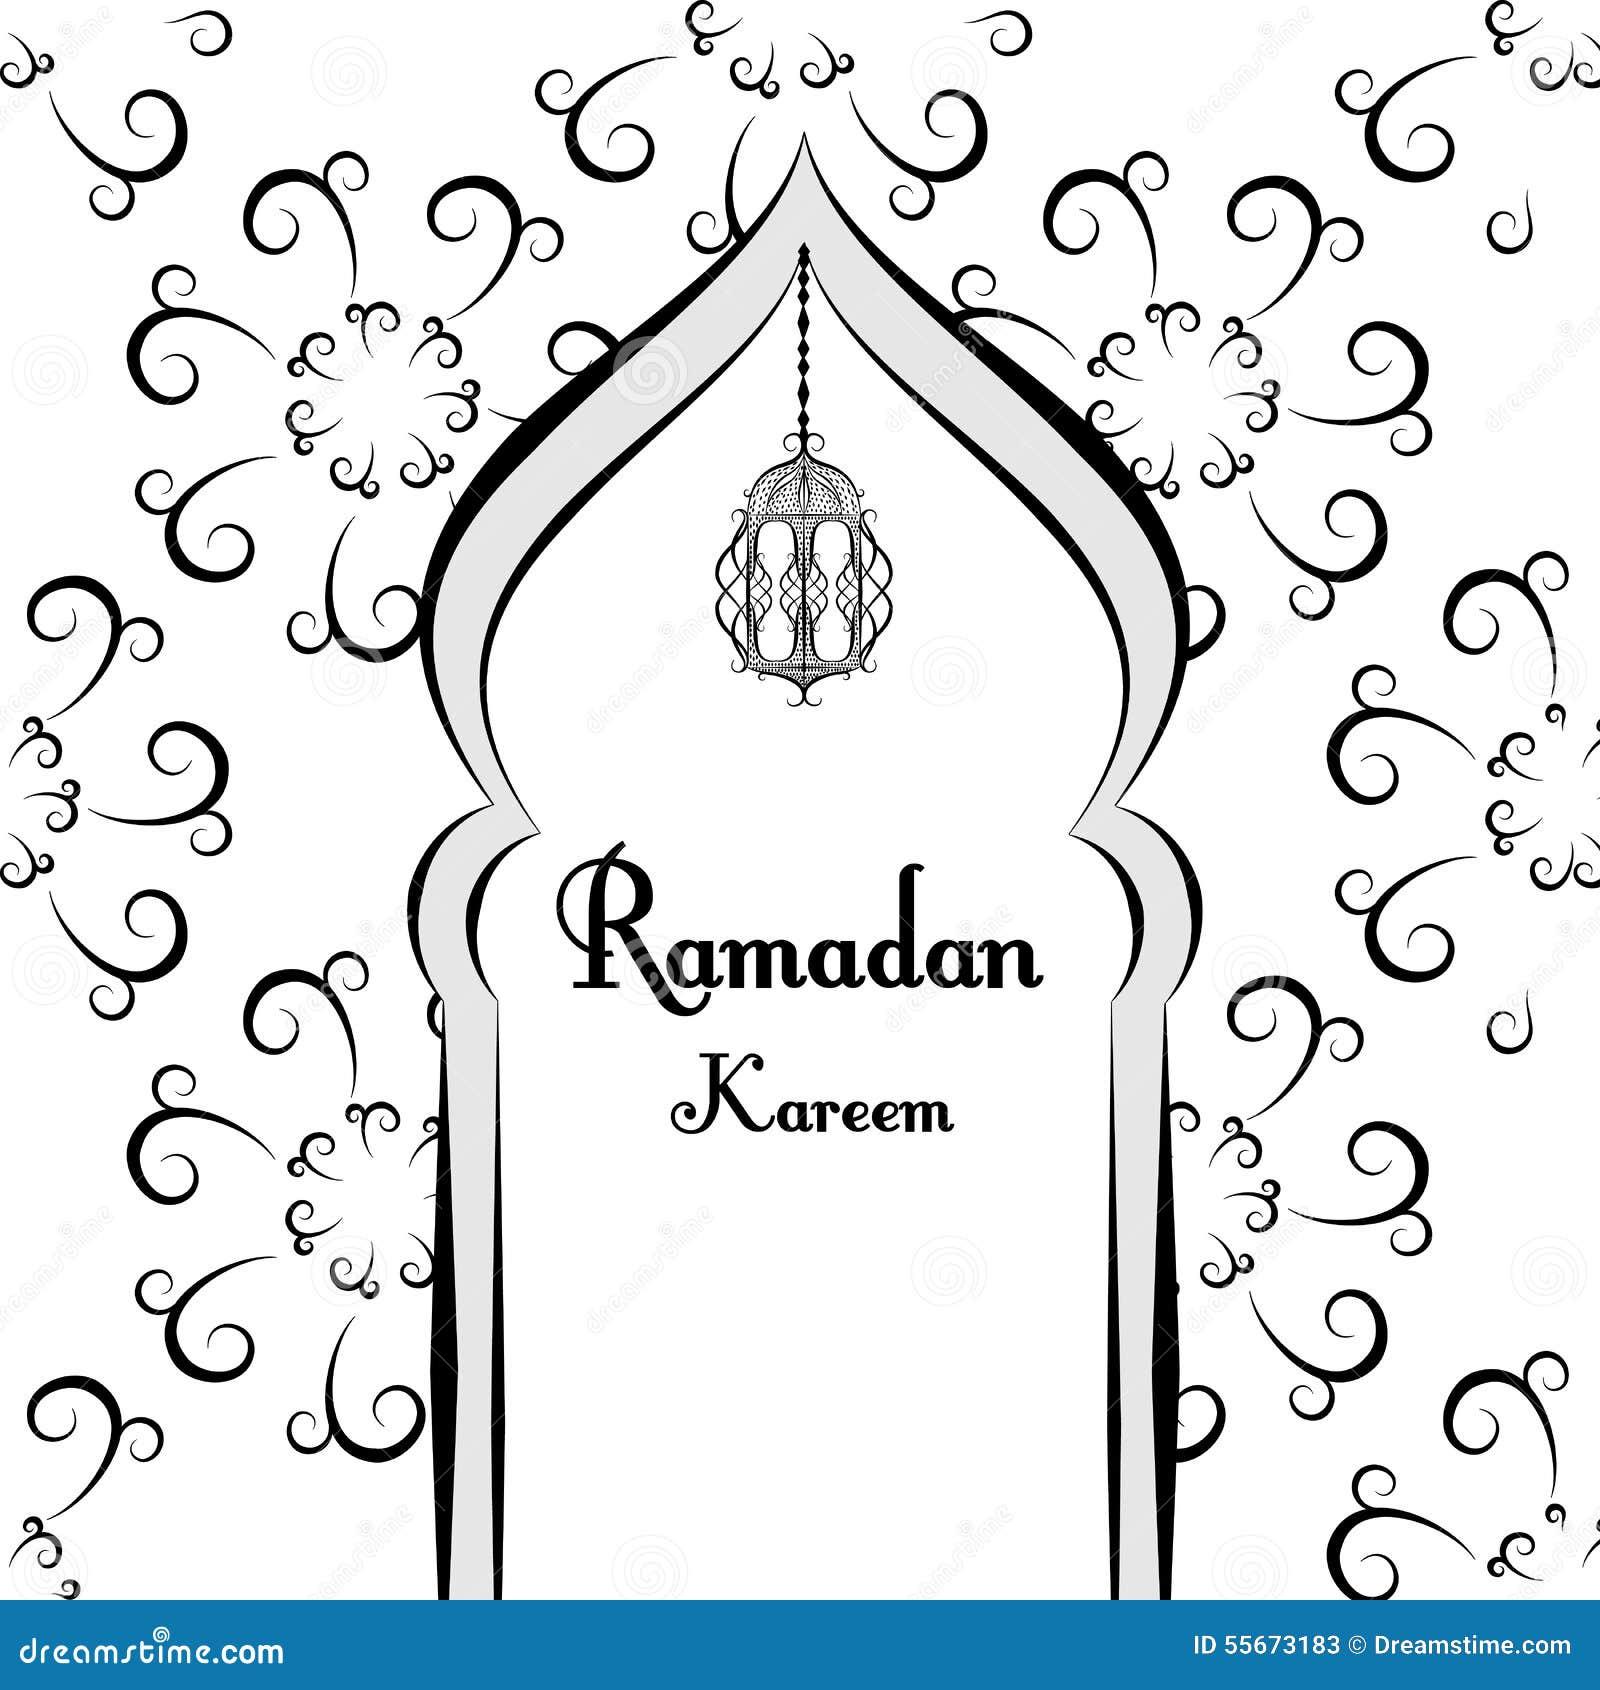 Black and white ramadan greetings background ramadan kareem means black and white ramadan greetings background ramadan kareem means mosque vector illustration kristyandbryce Images